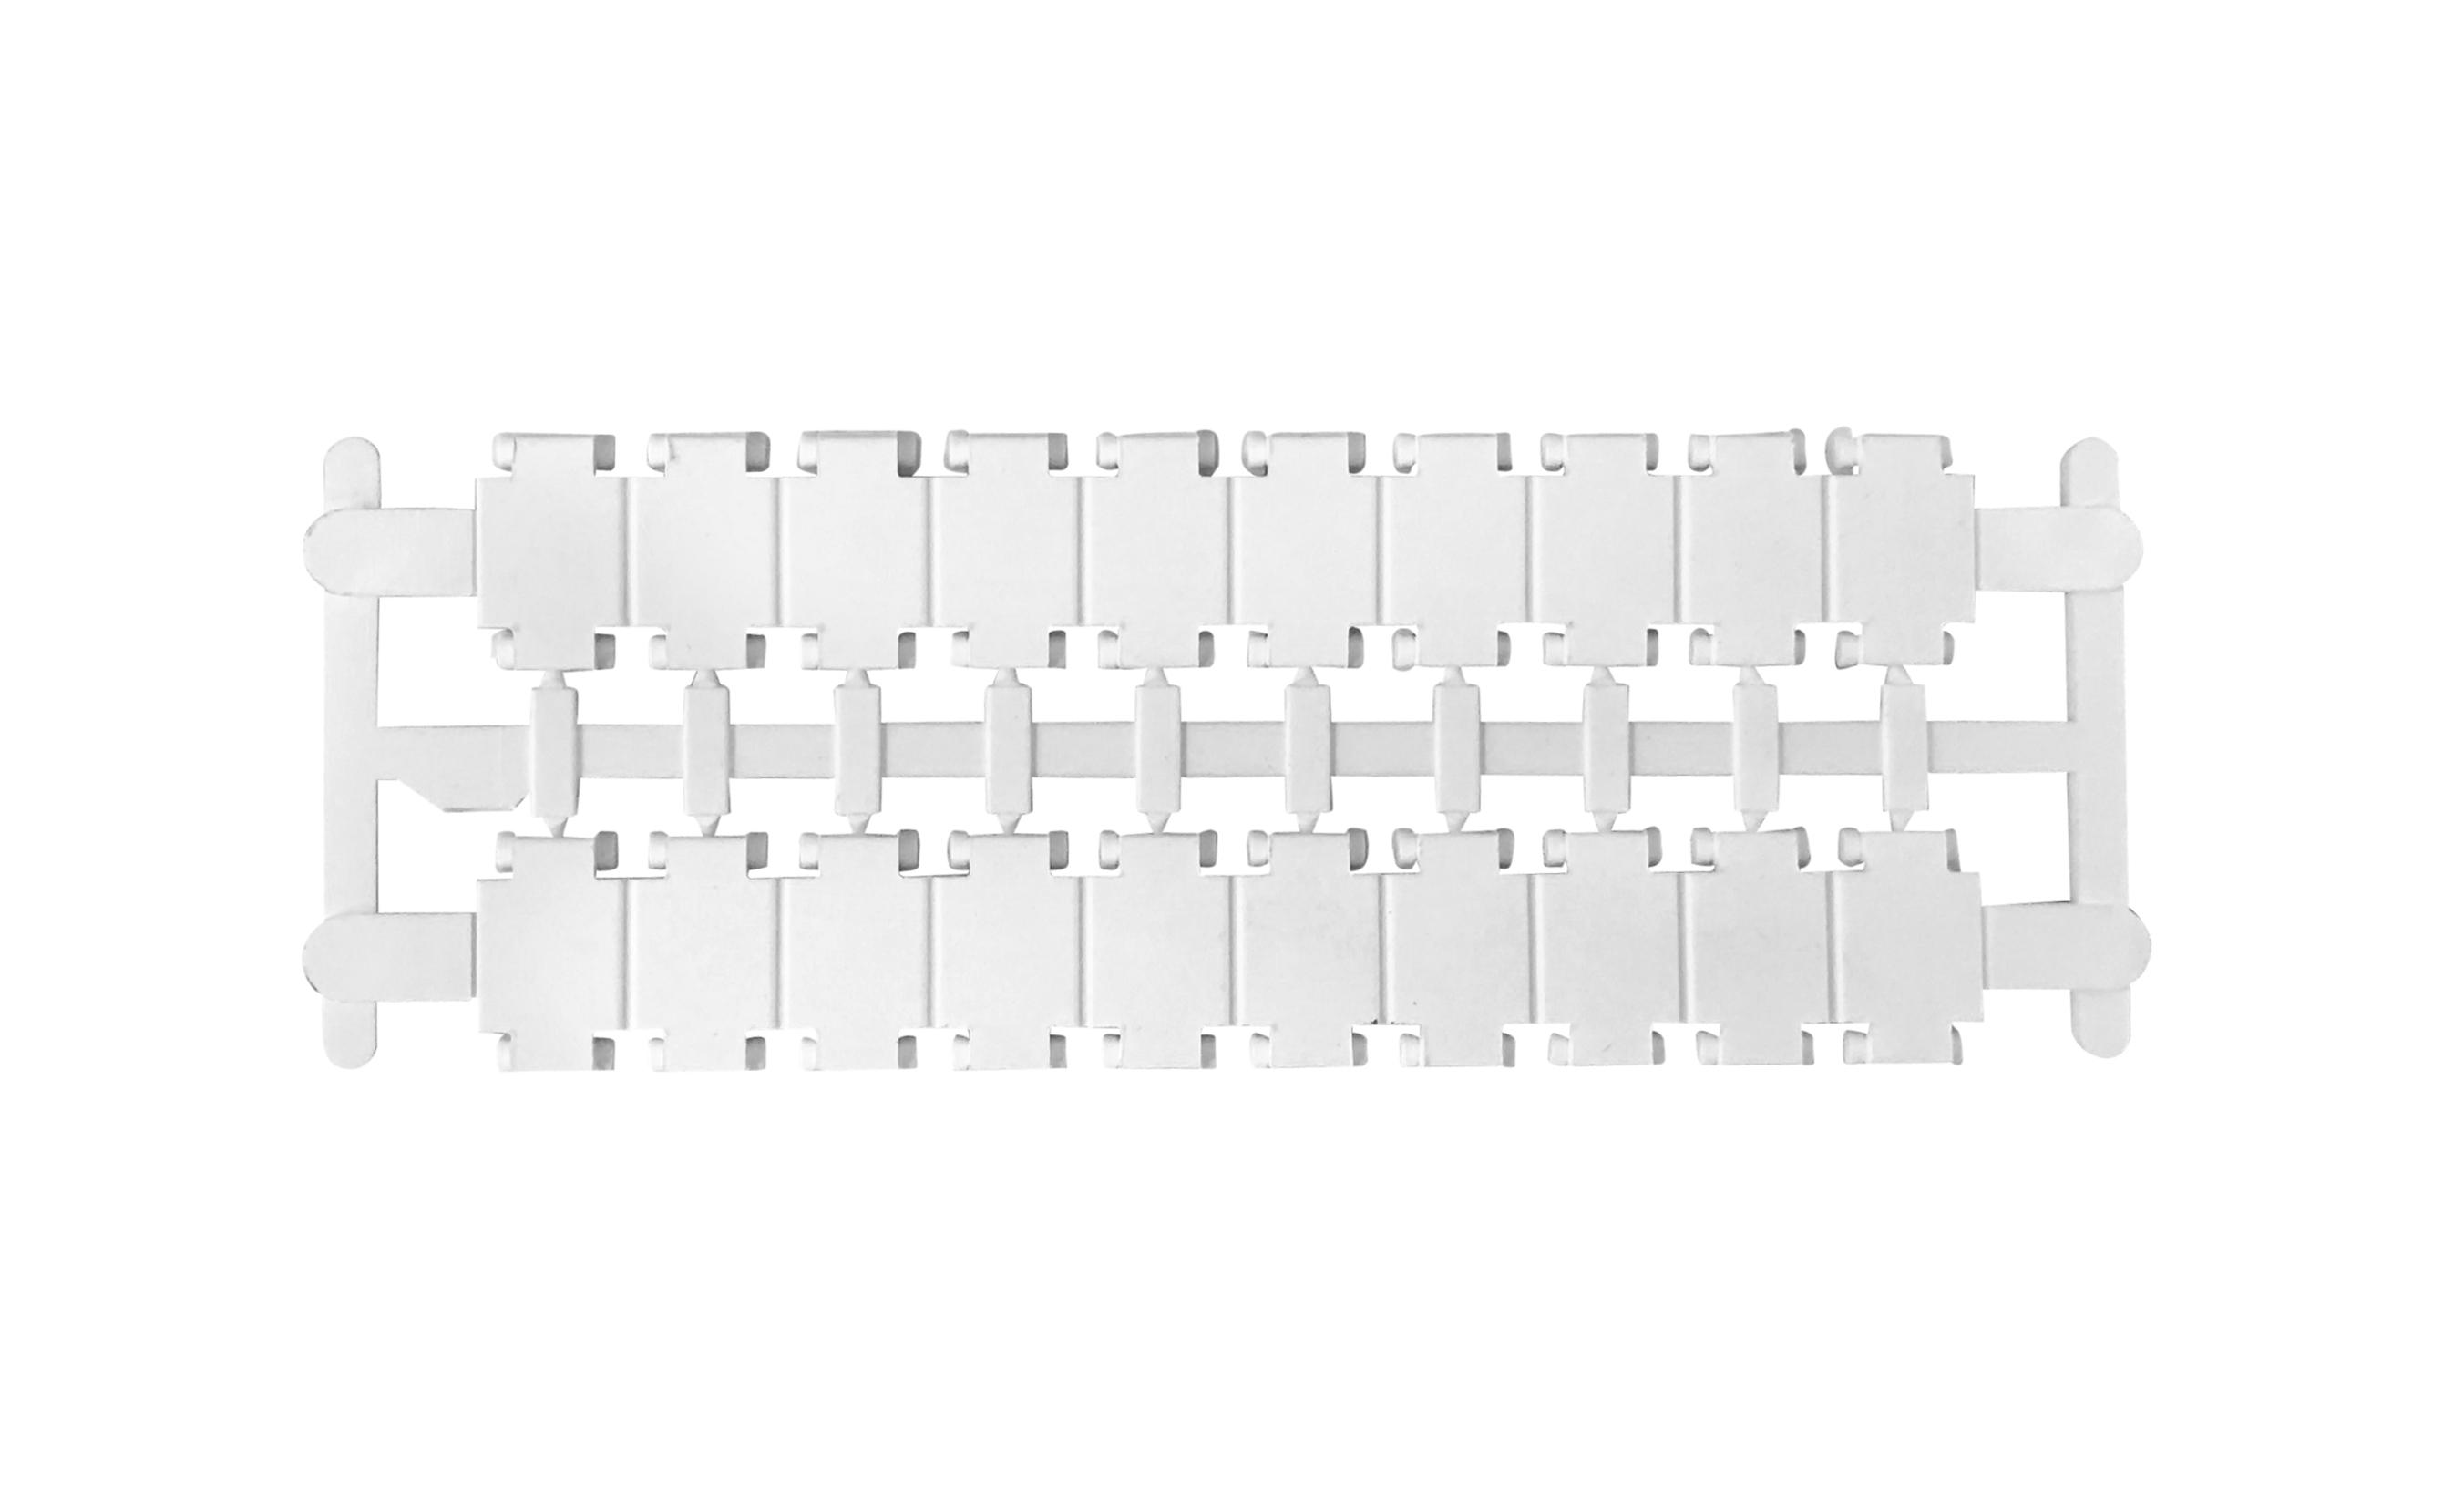 Cleme terminale contact elastic IK231758